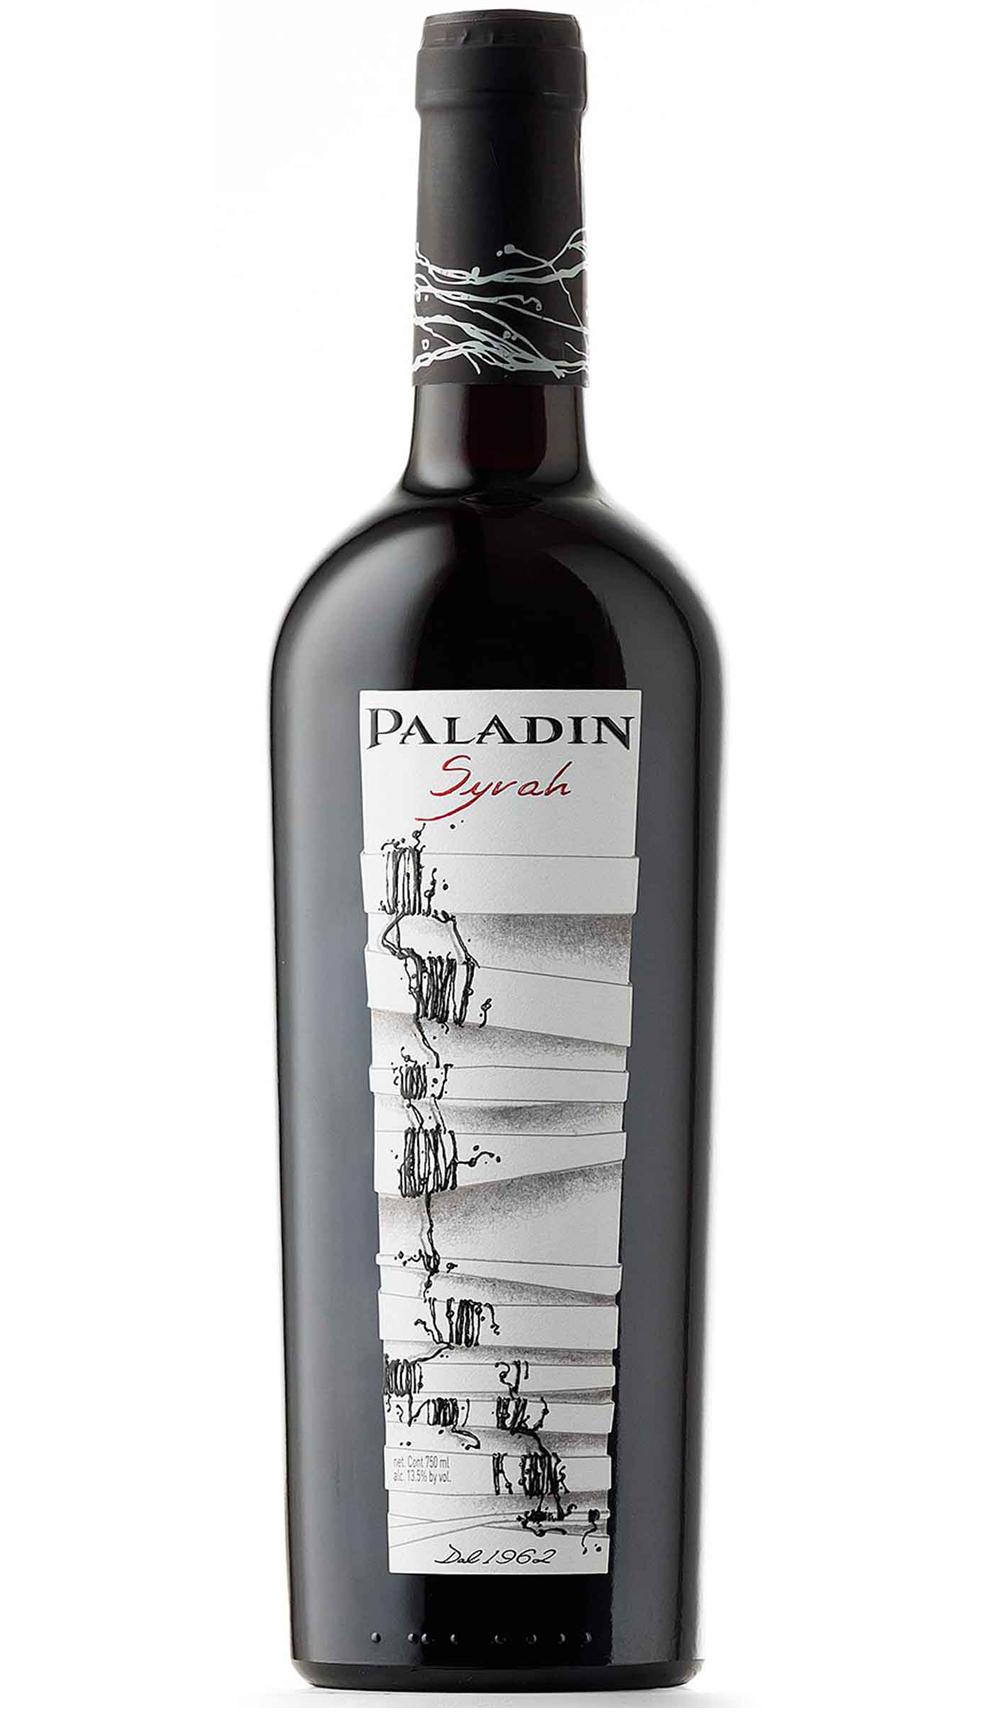 Paladin, syrah, 2013